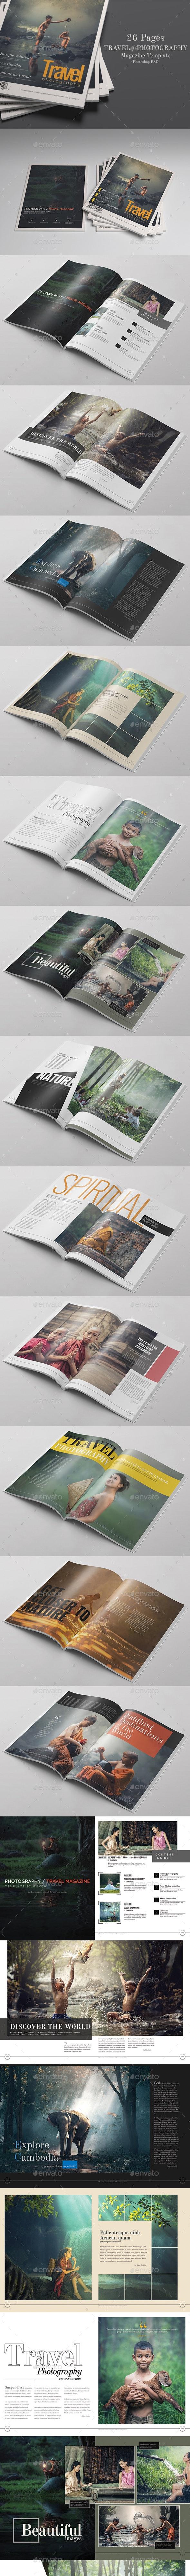 Photography / Travel Magazine Template - Magazines Print Templates